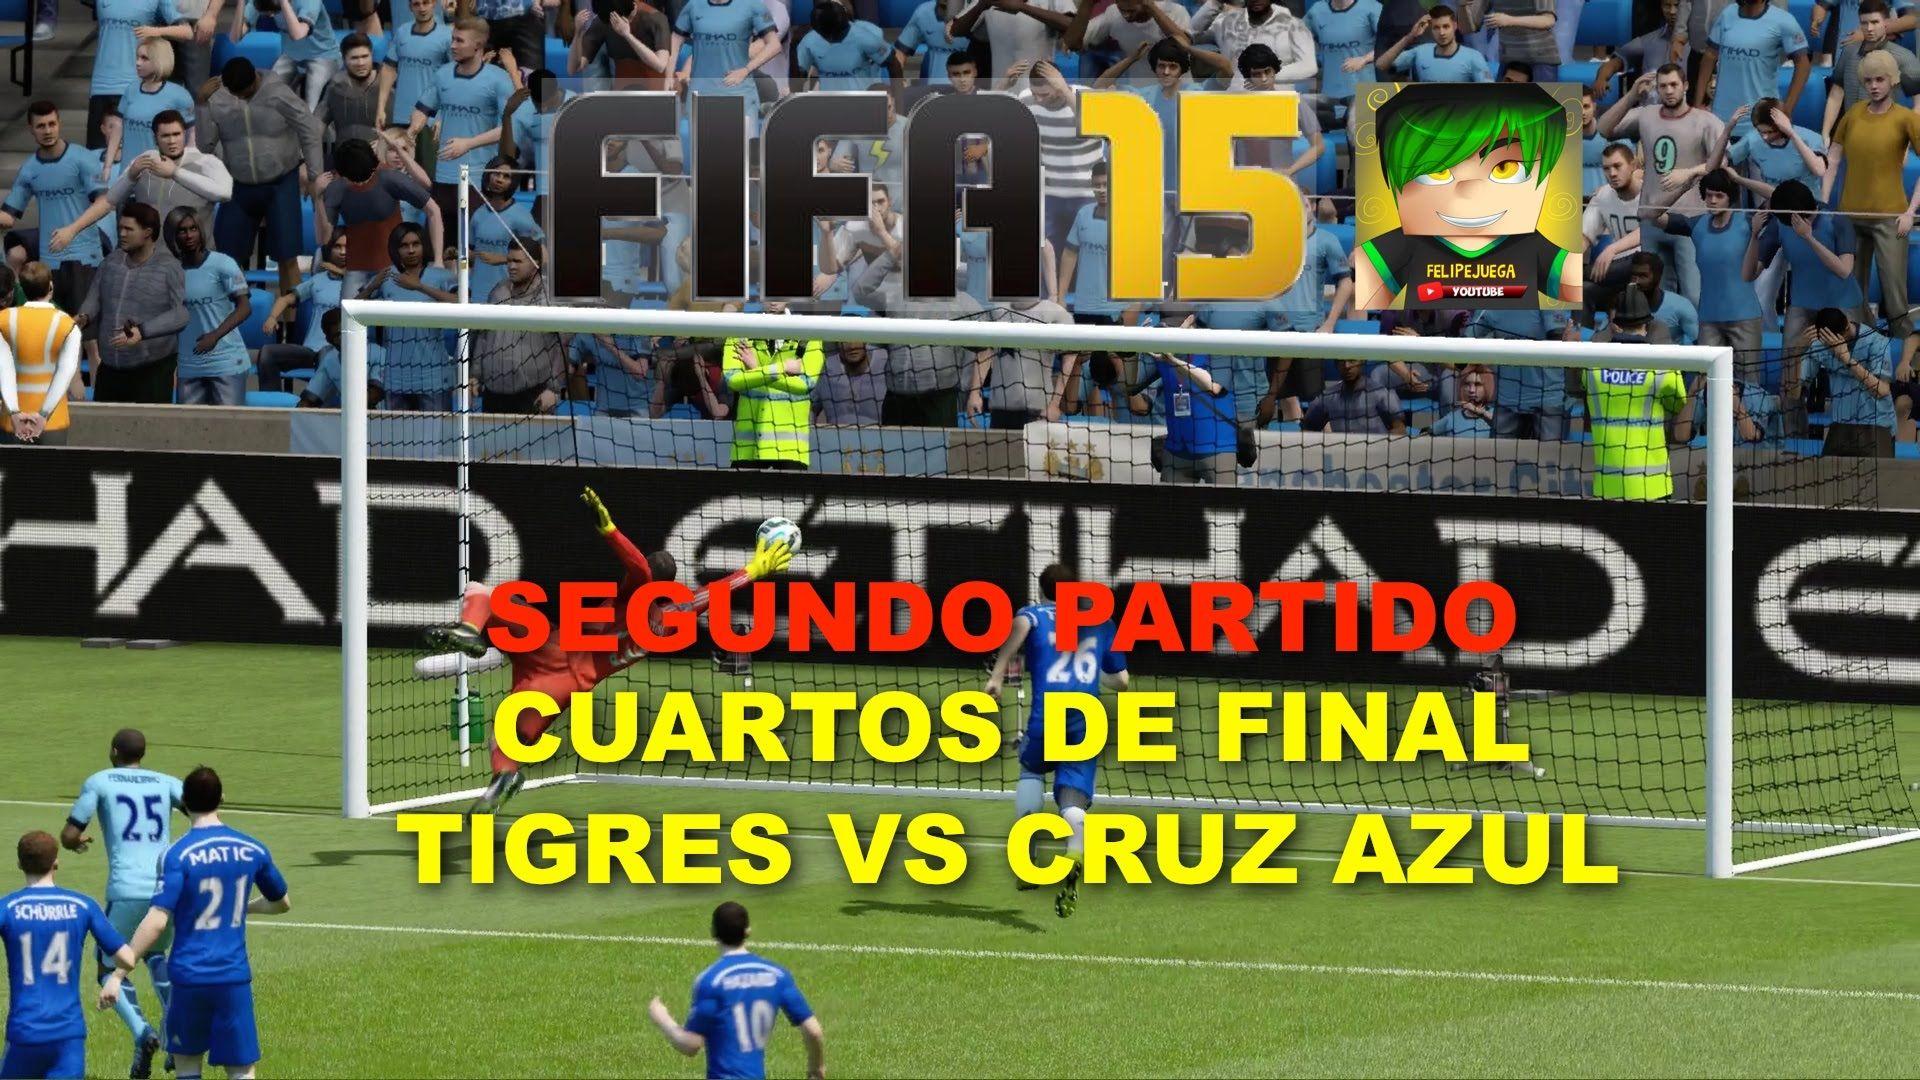 FIFA Copa Mexico Tigres vs Cruz Azul Cuartos de Final